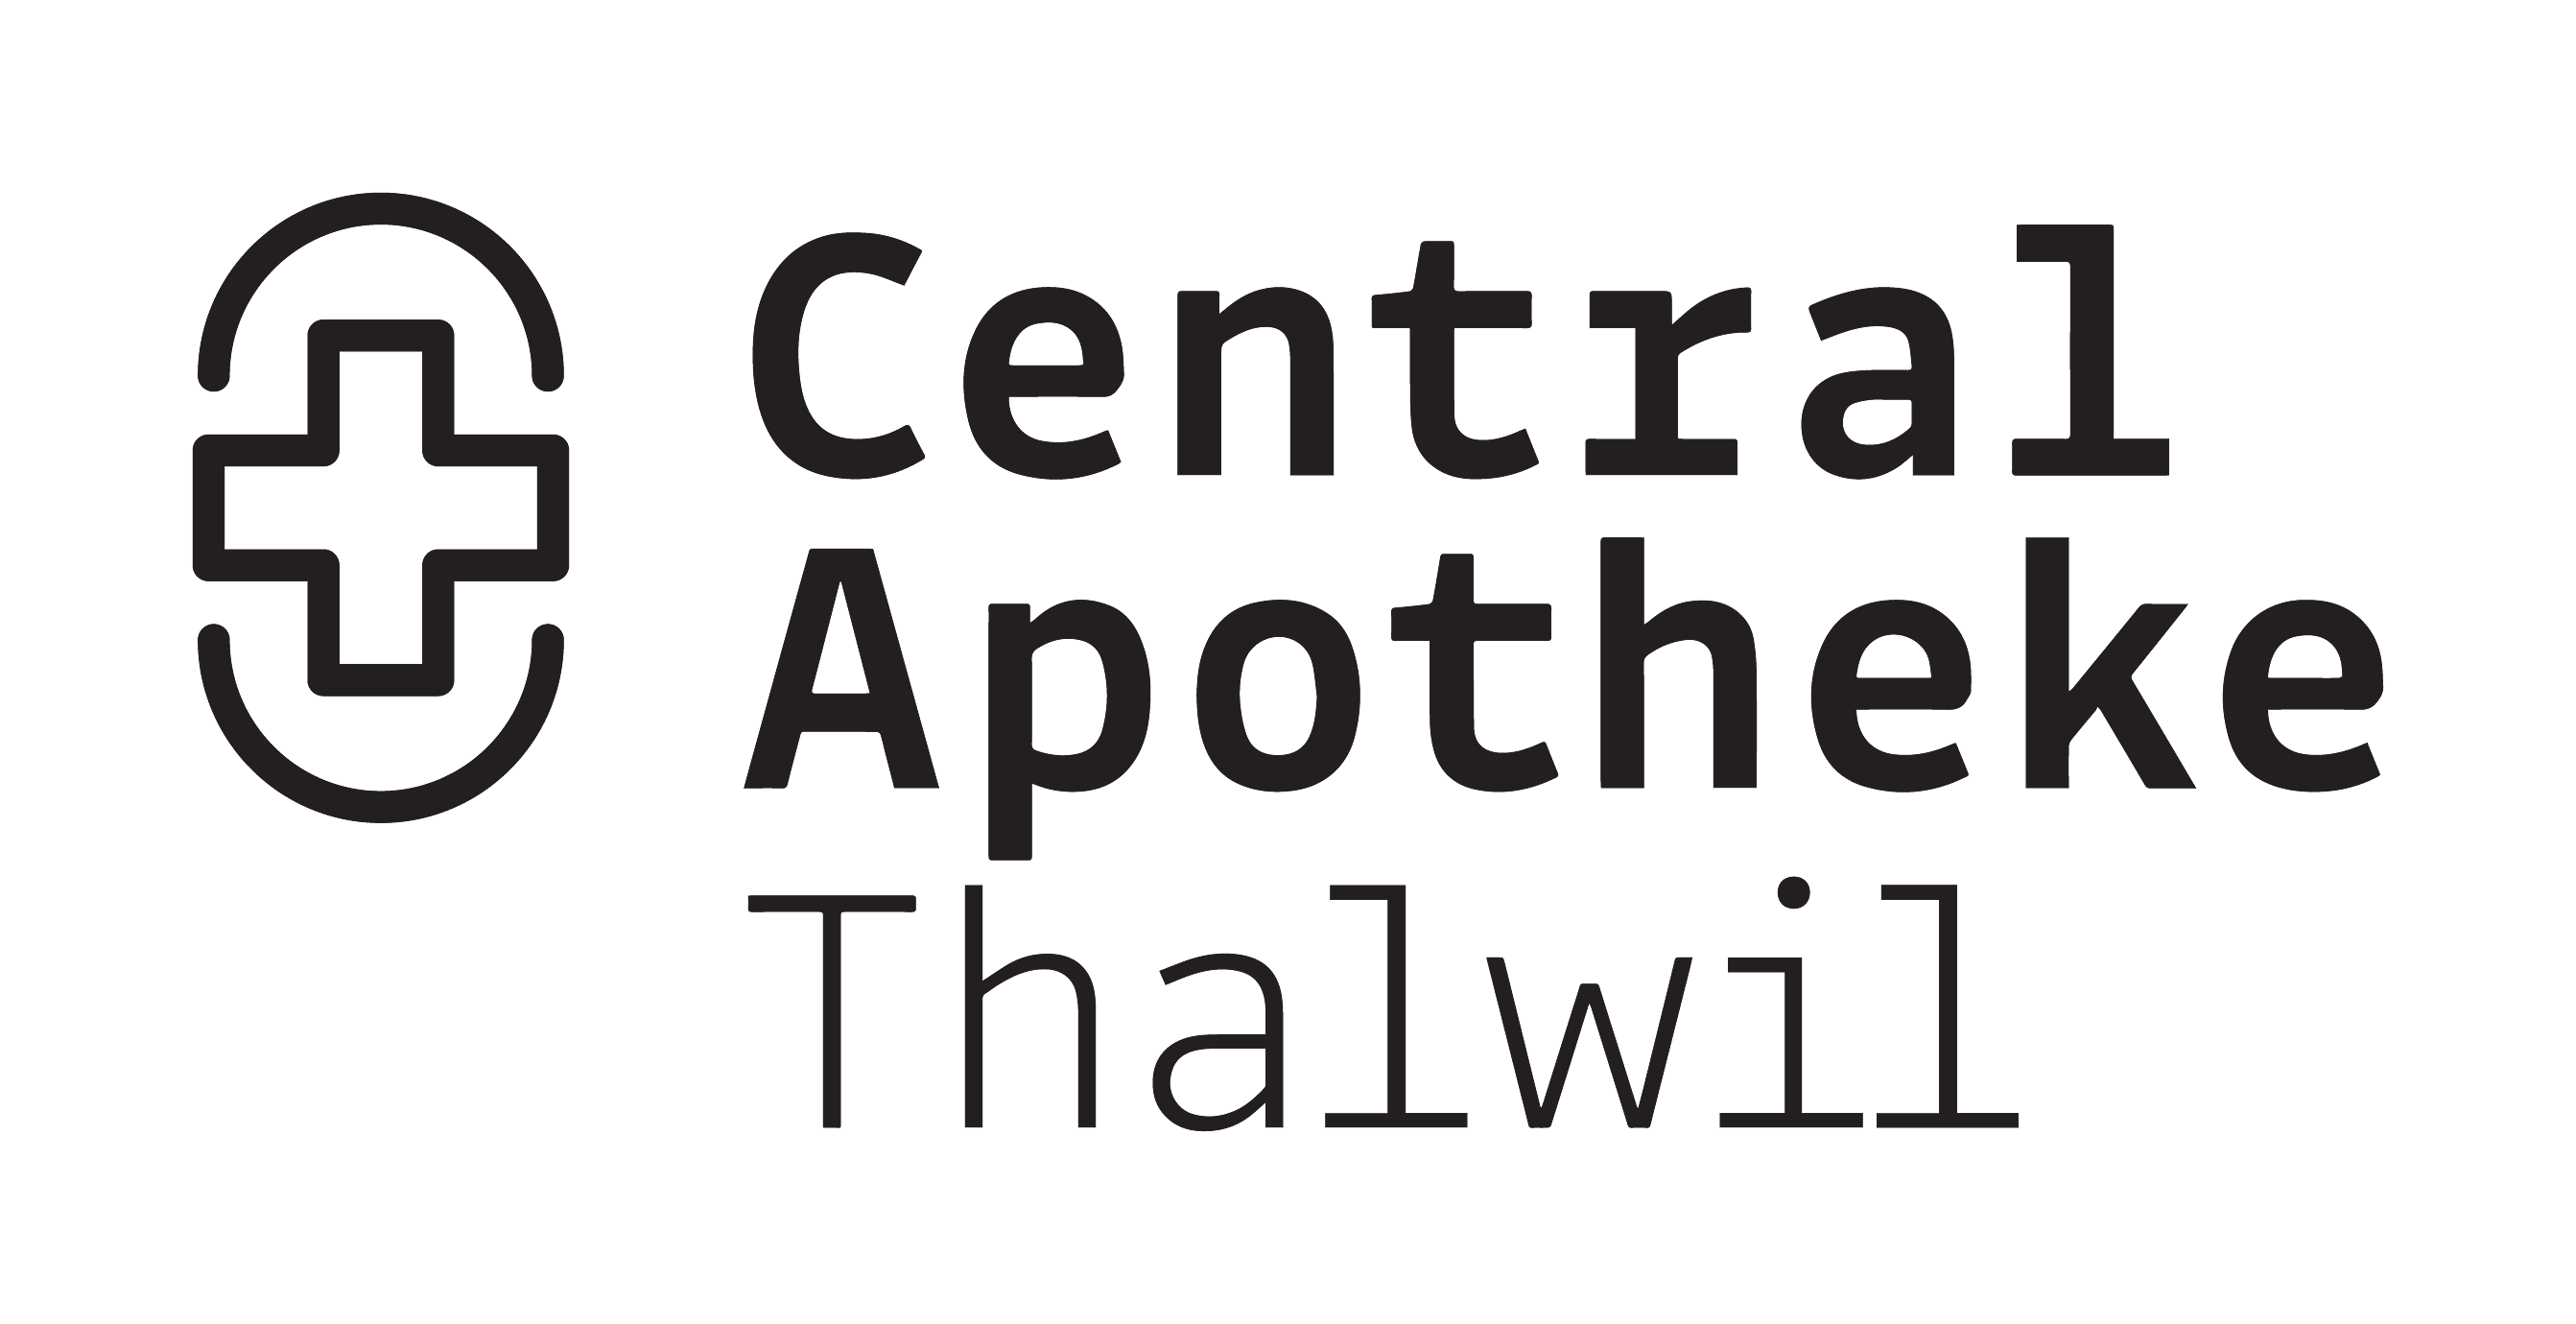 Central Apotheke Thalwil